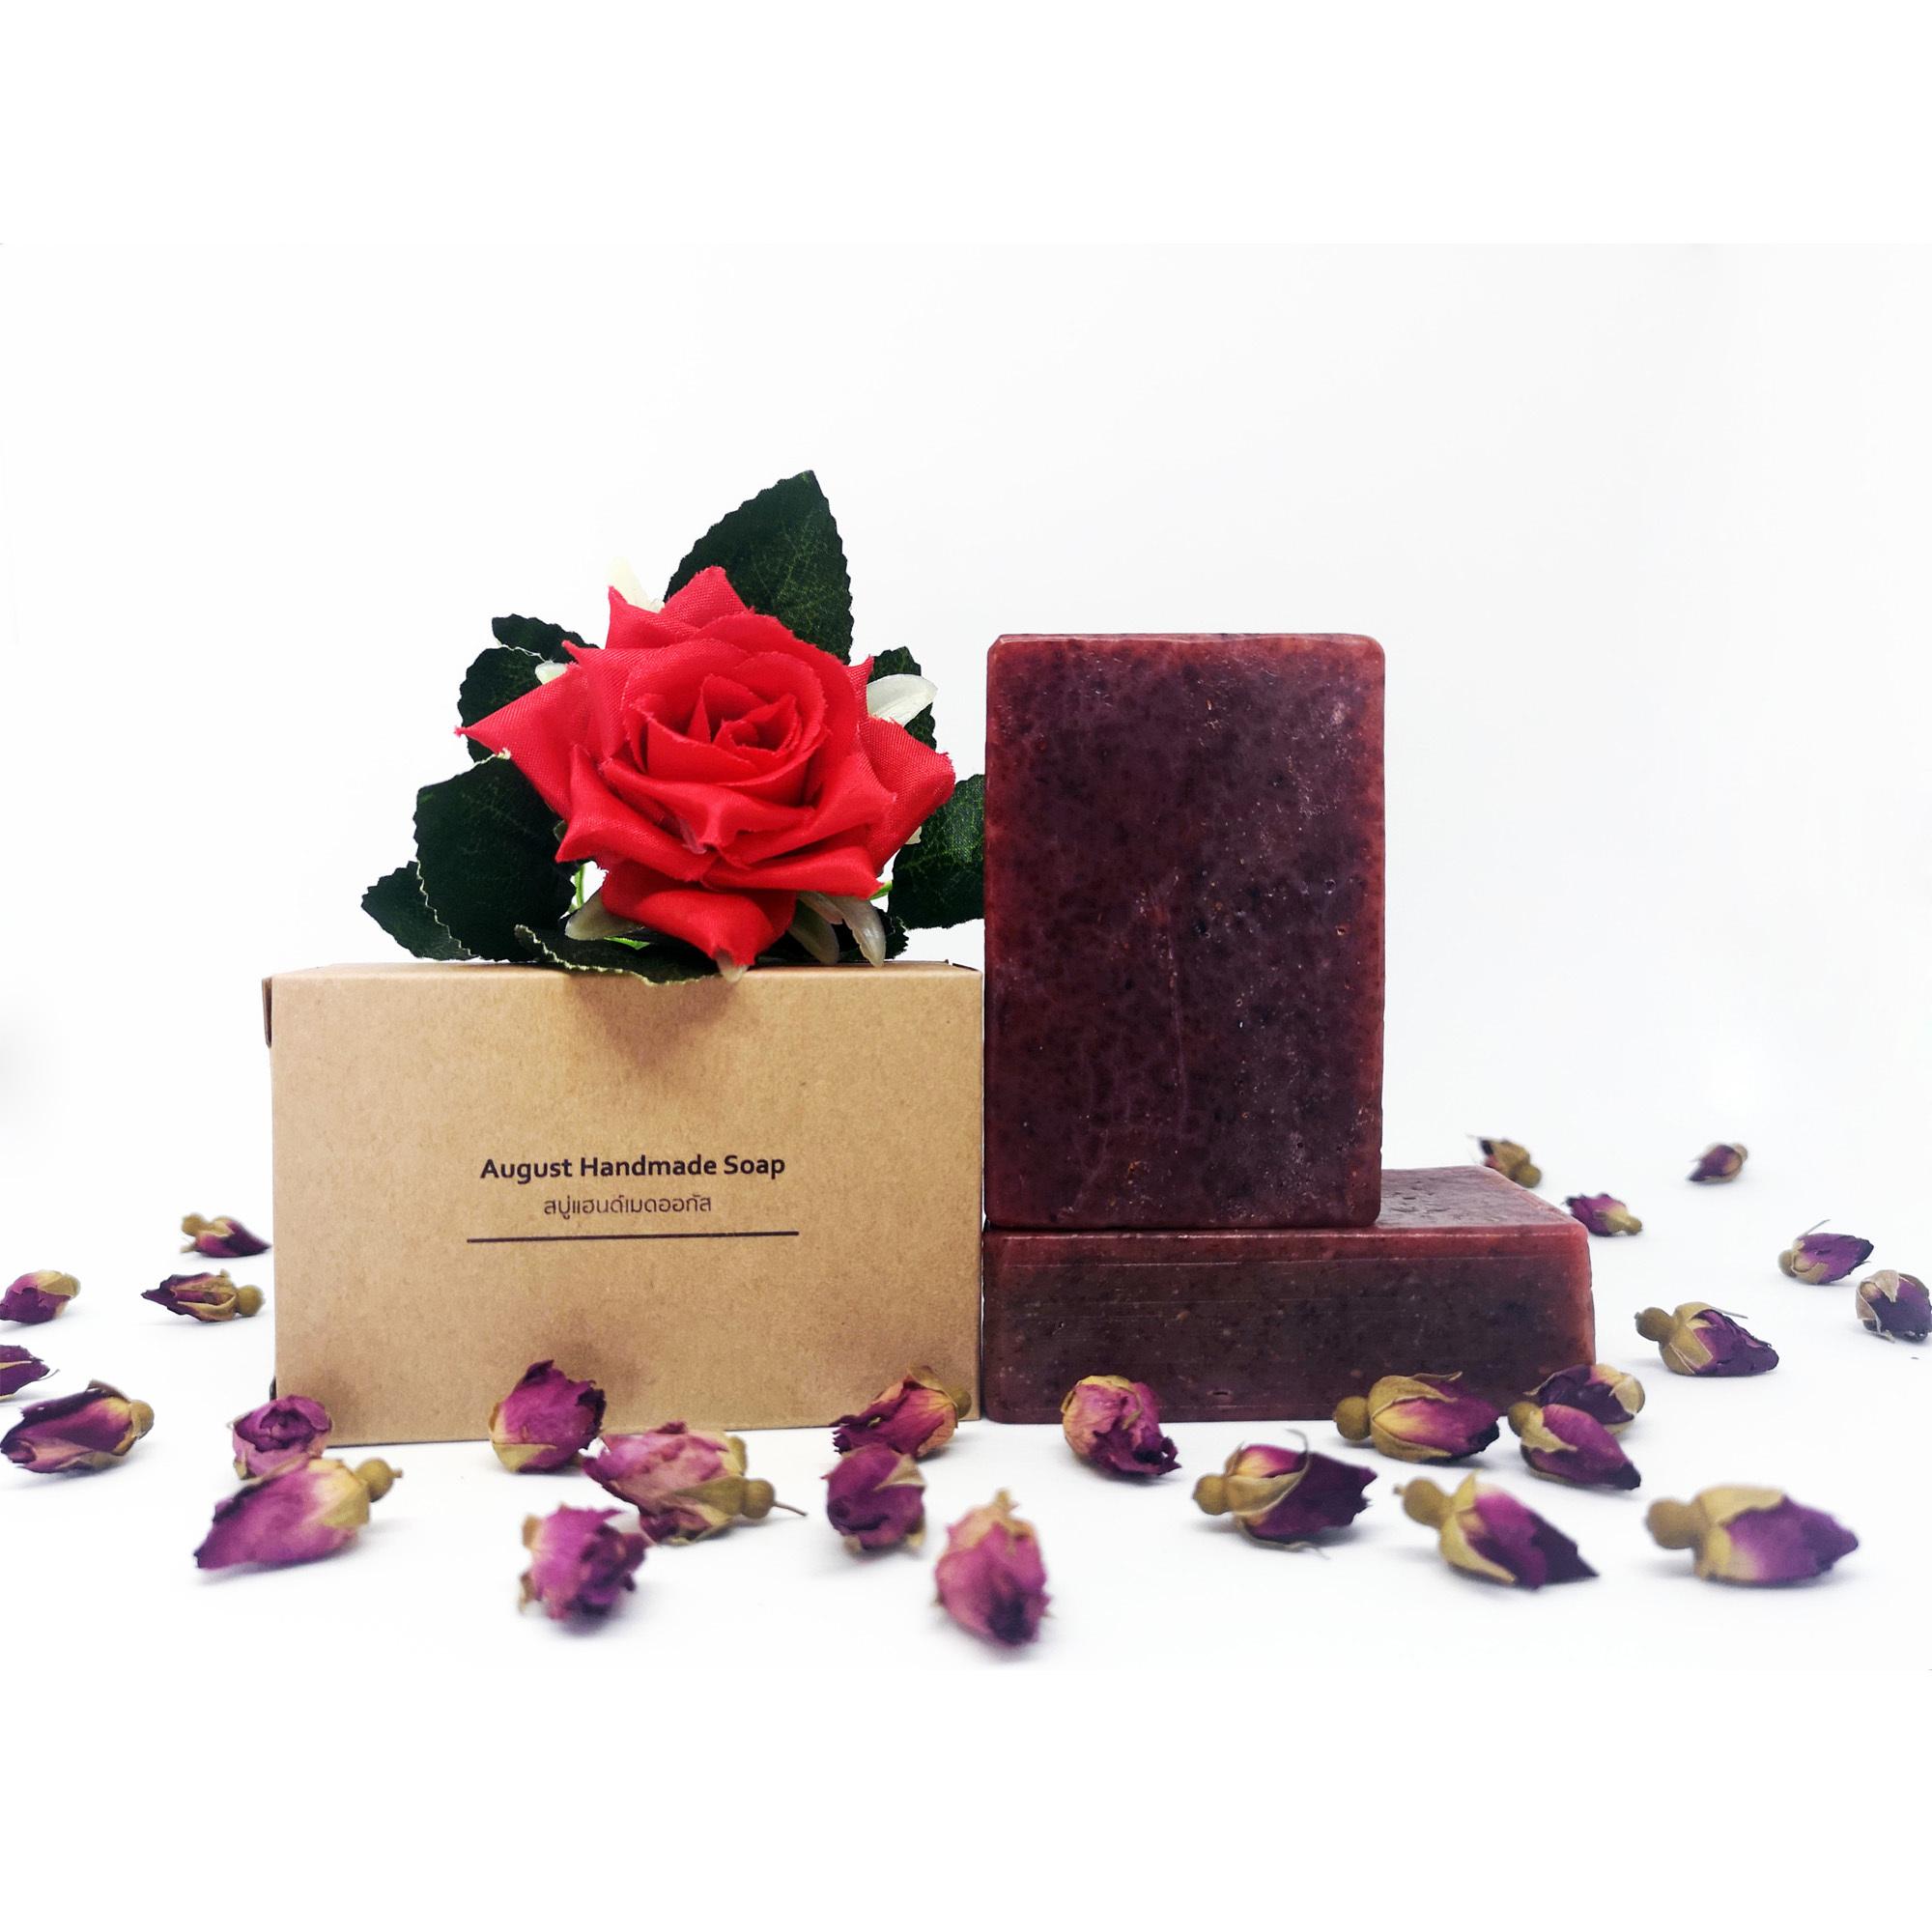 August Handmade Soap